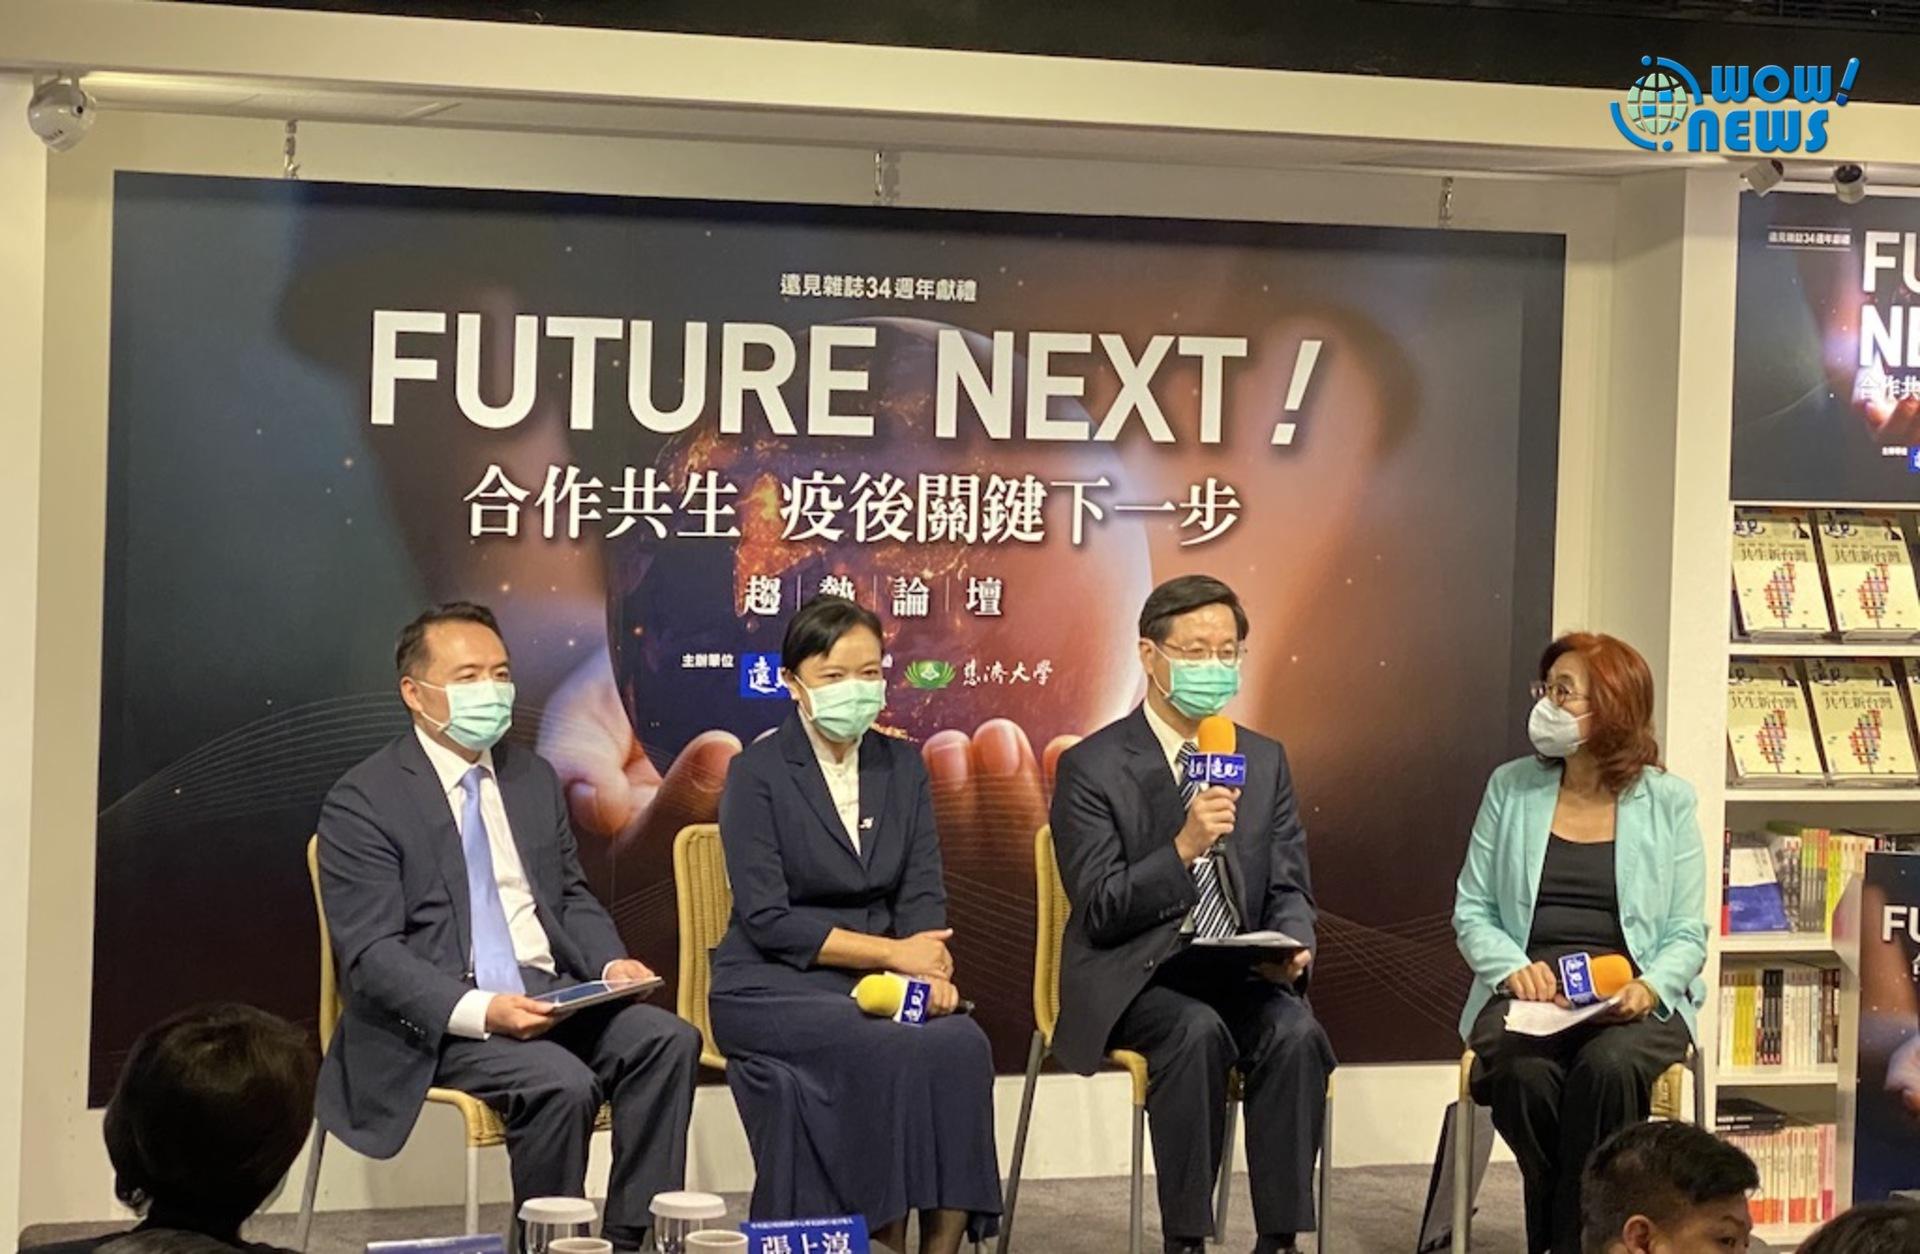 Future Next!合作共生 疫後關鍵下一步防疫專家籲勿陷+0迷思